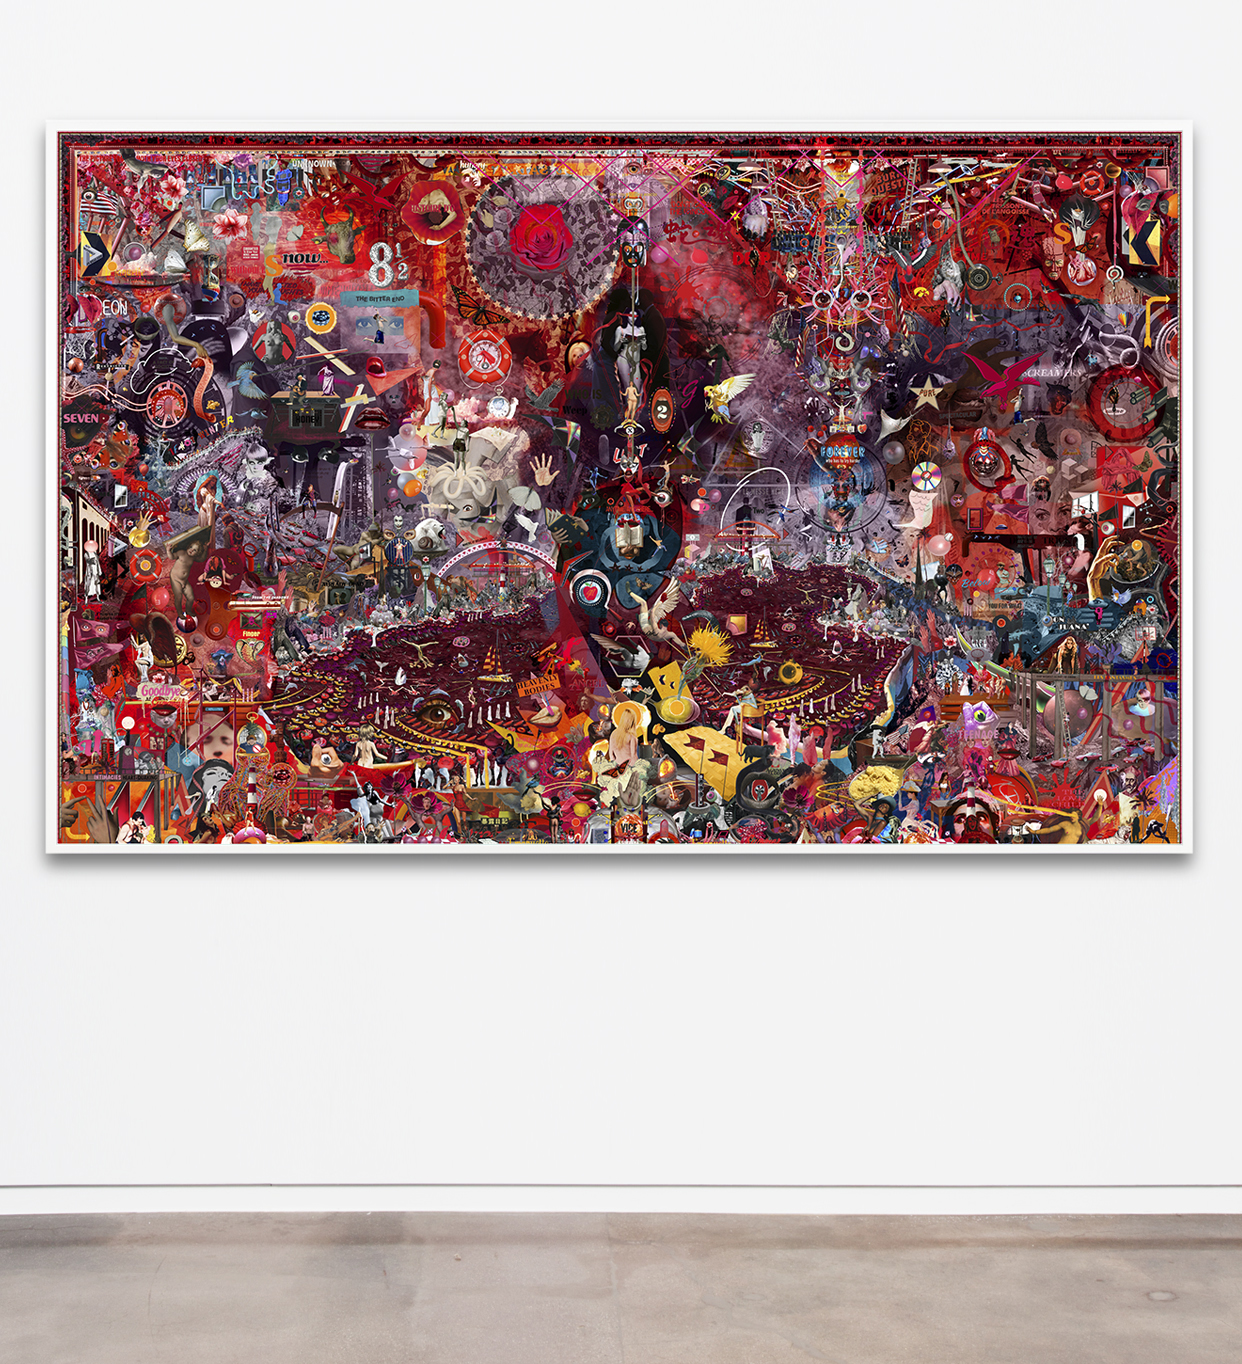 Case Simmons, Simmons & Burke, If Not Summer #1, Kohn Gallery, Hieronymus Bosch, Lightjet Print, Digital Collage,Digital Art, Photoshop Collage, Contemporary Collage,Case Simmons Art, Case Simmons Artist, Collage Fine Art, Hyper Collage, Future Collage